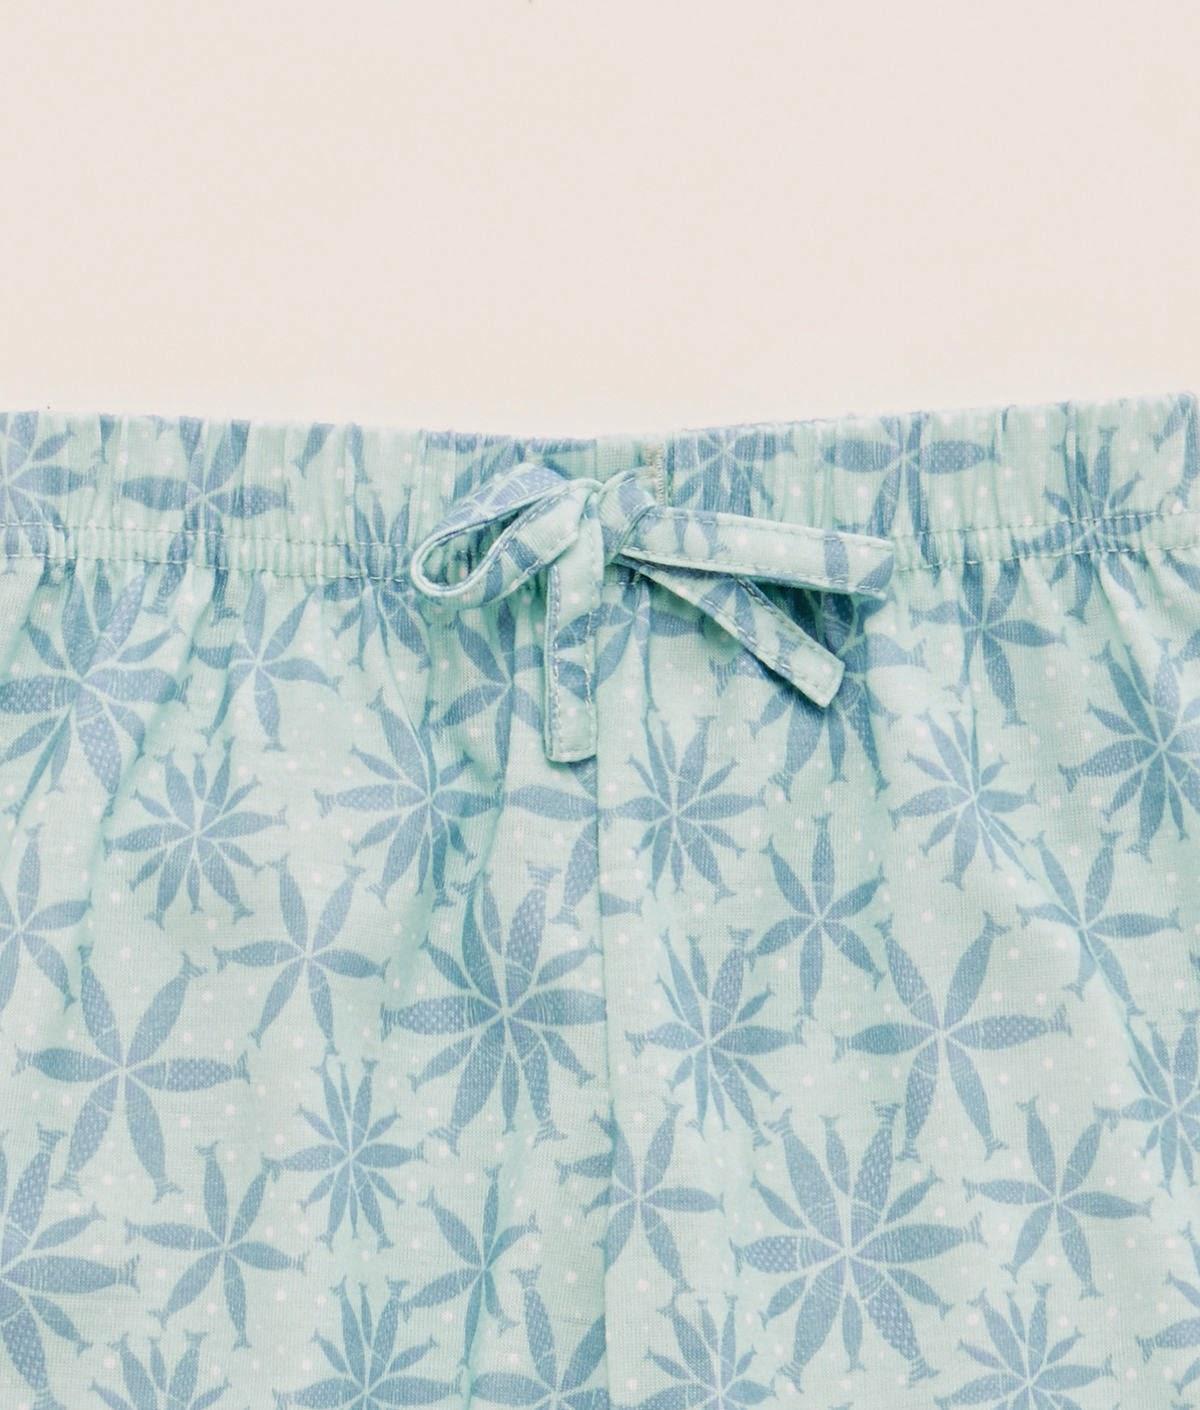 Nautical holiday pajamas from Vineyard Vines